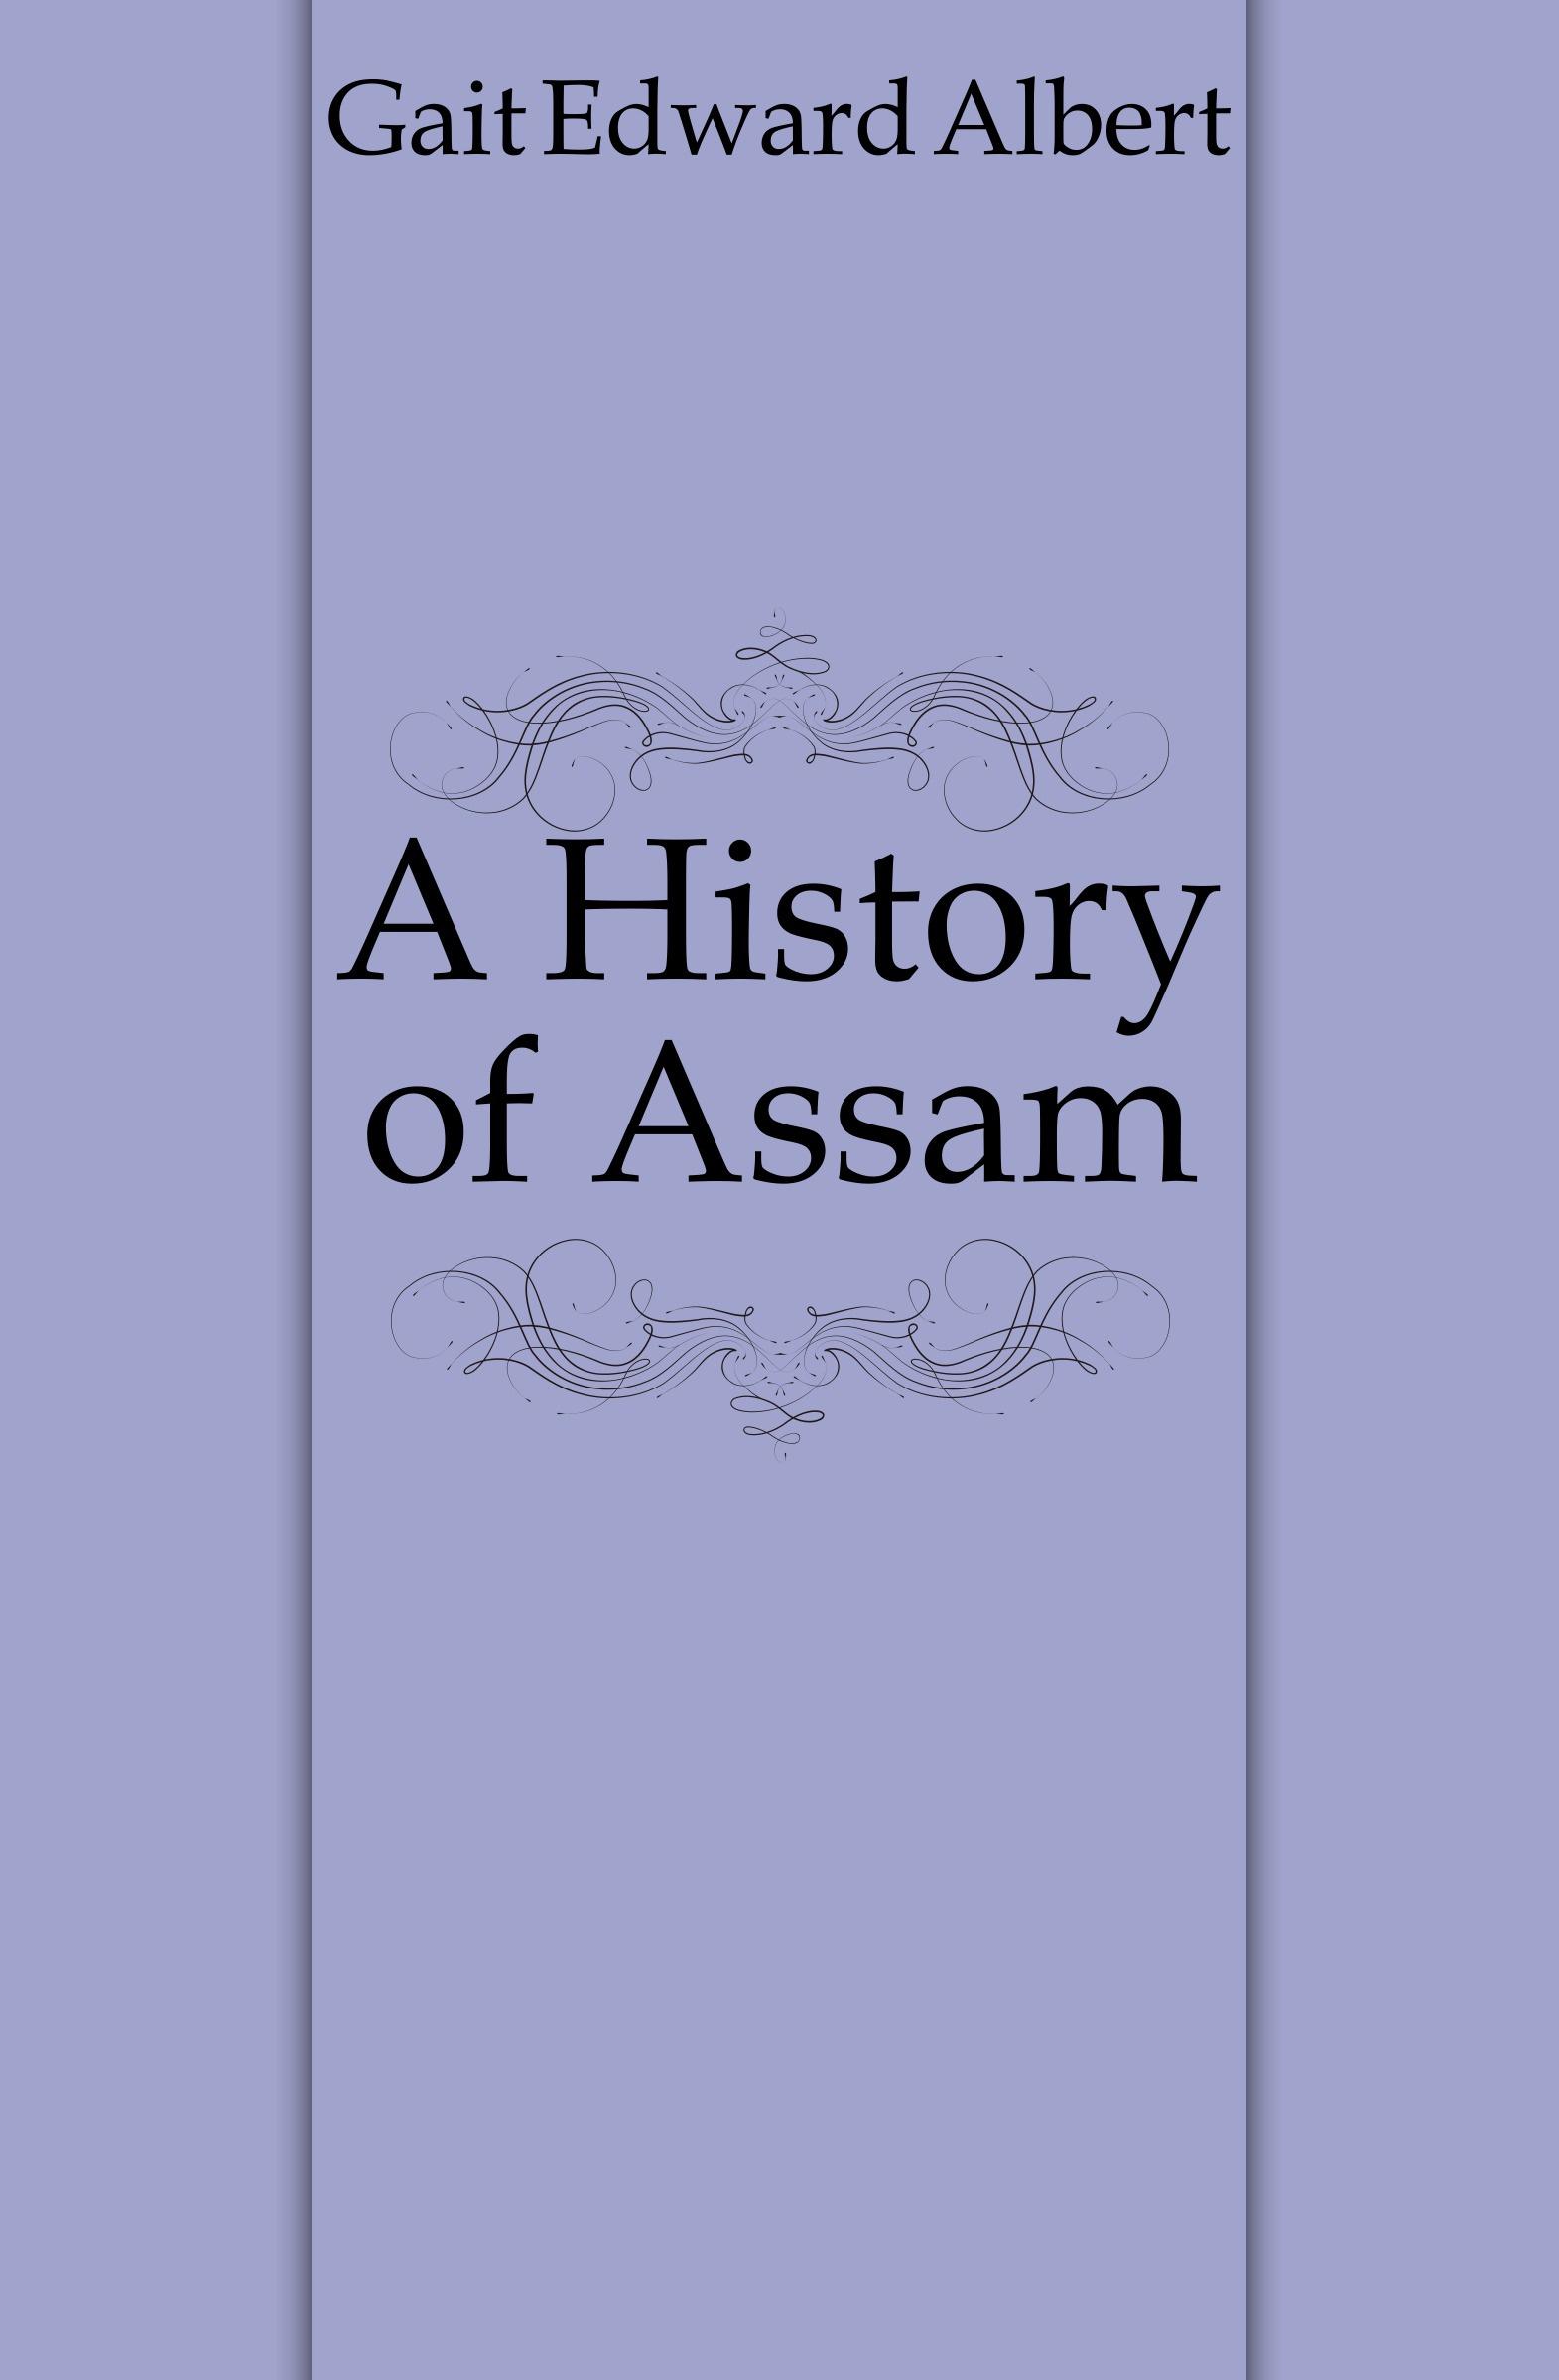 Gait Edward Albert A History of Assam biomechanics of steppage gait